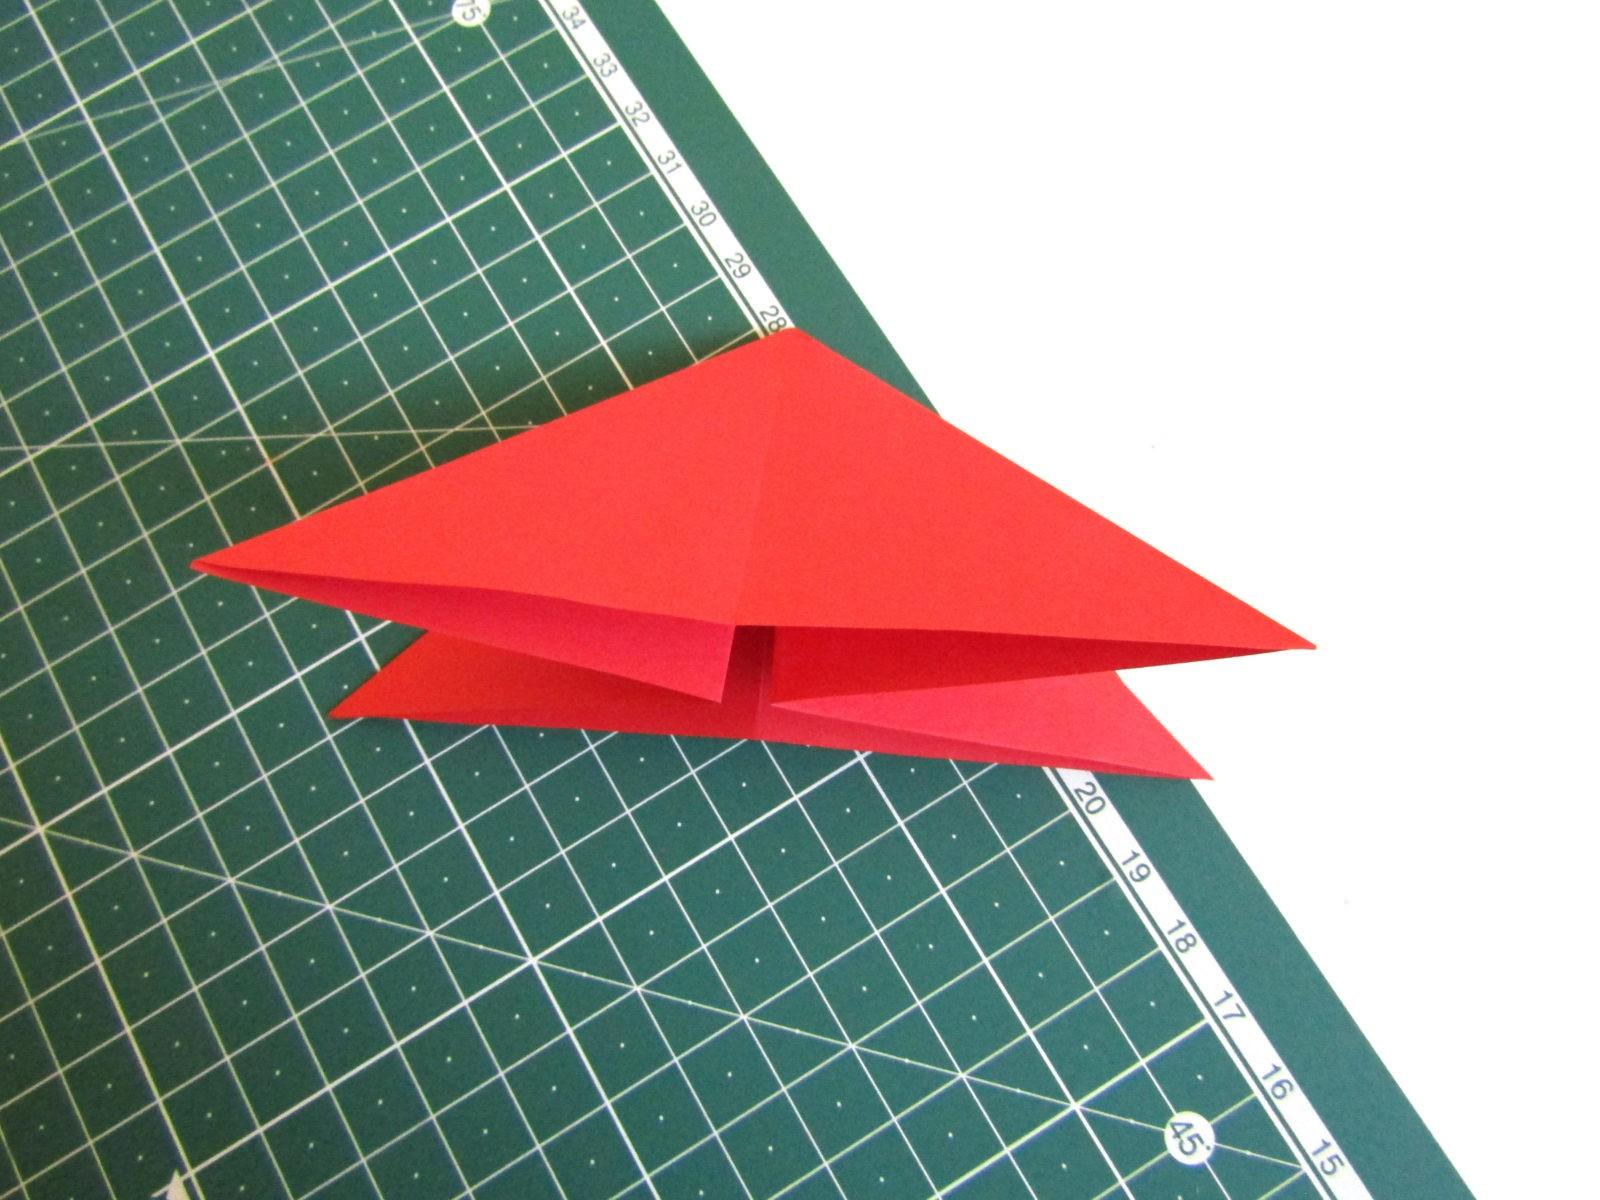 Оригами тюльпан из бумаги -4